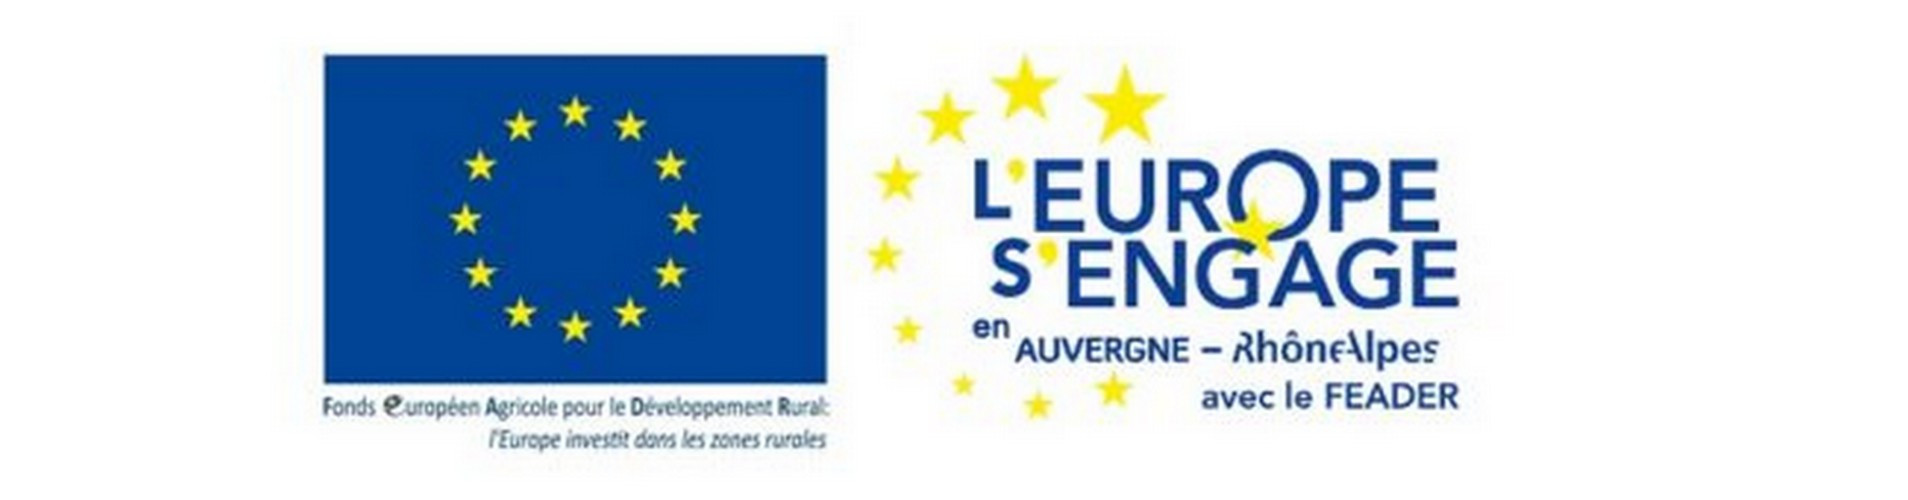 Logo_pageeurope_feader-1-650x170.jpg